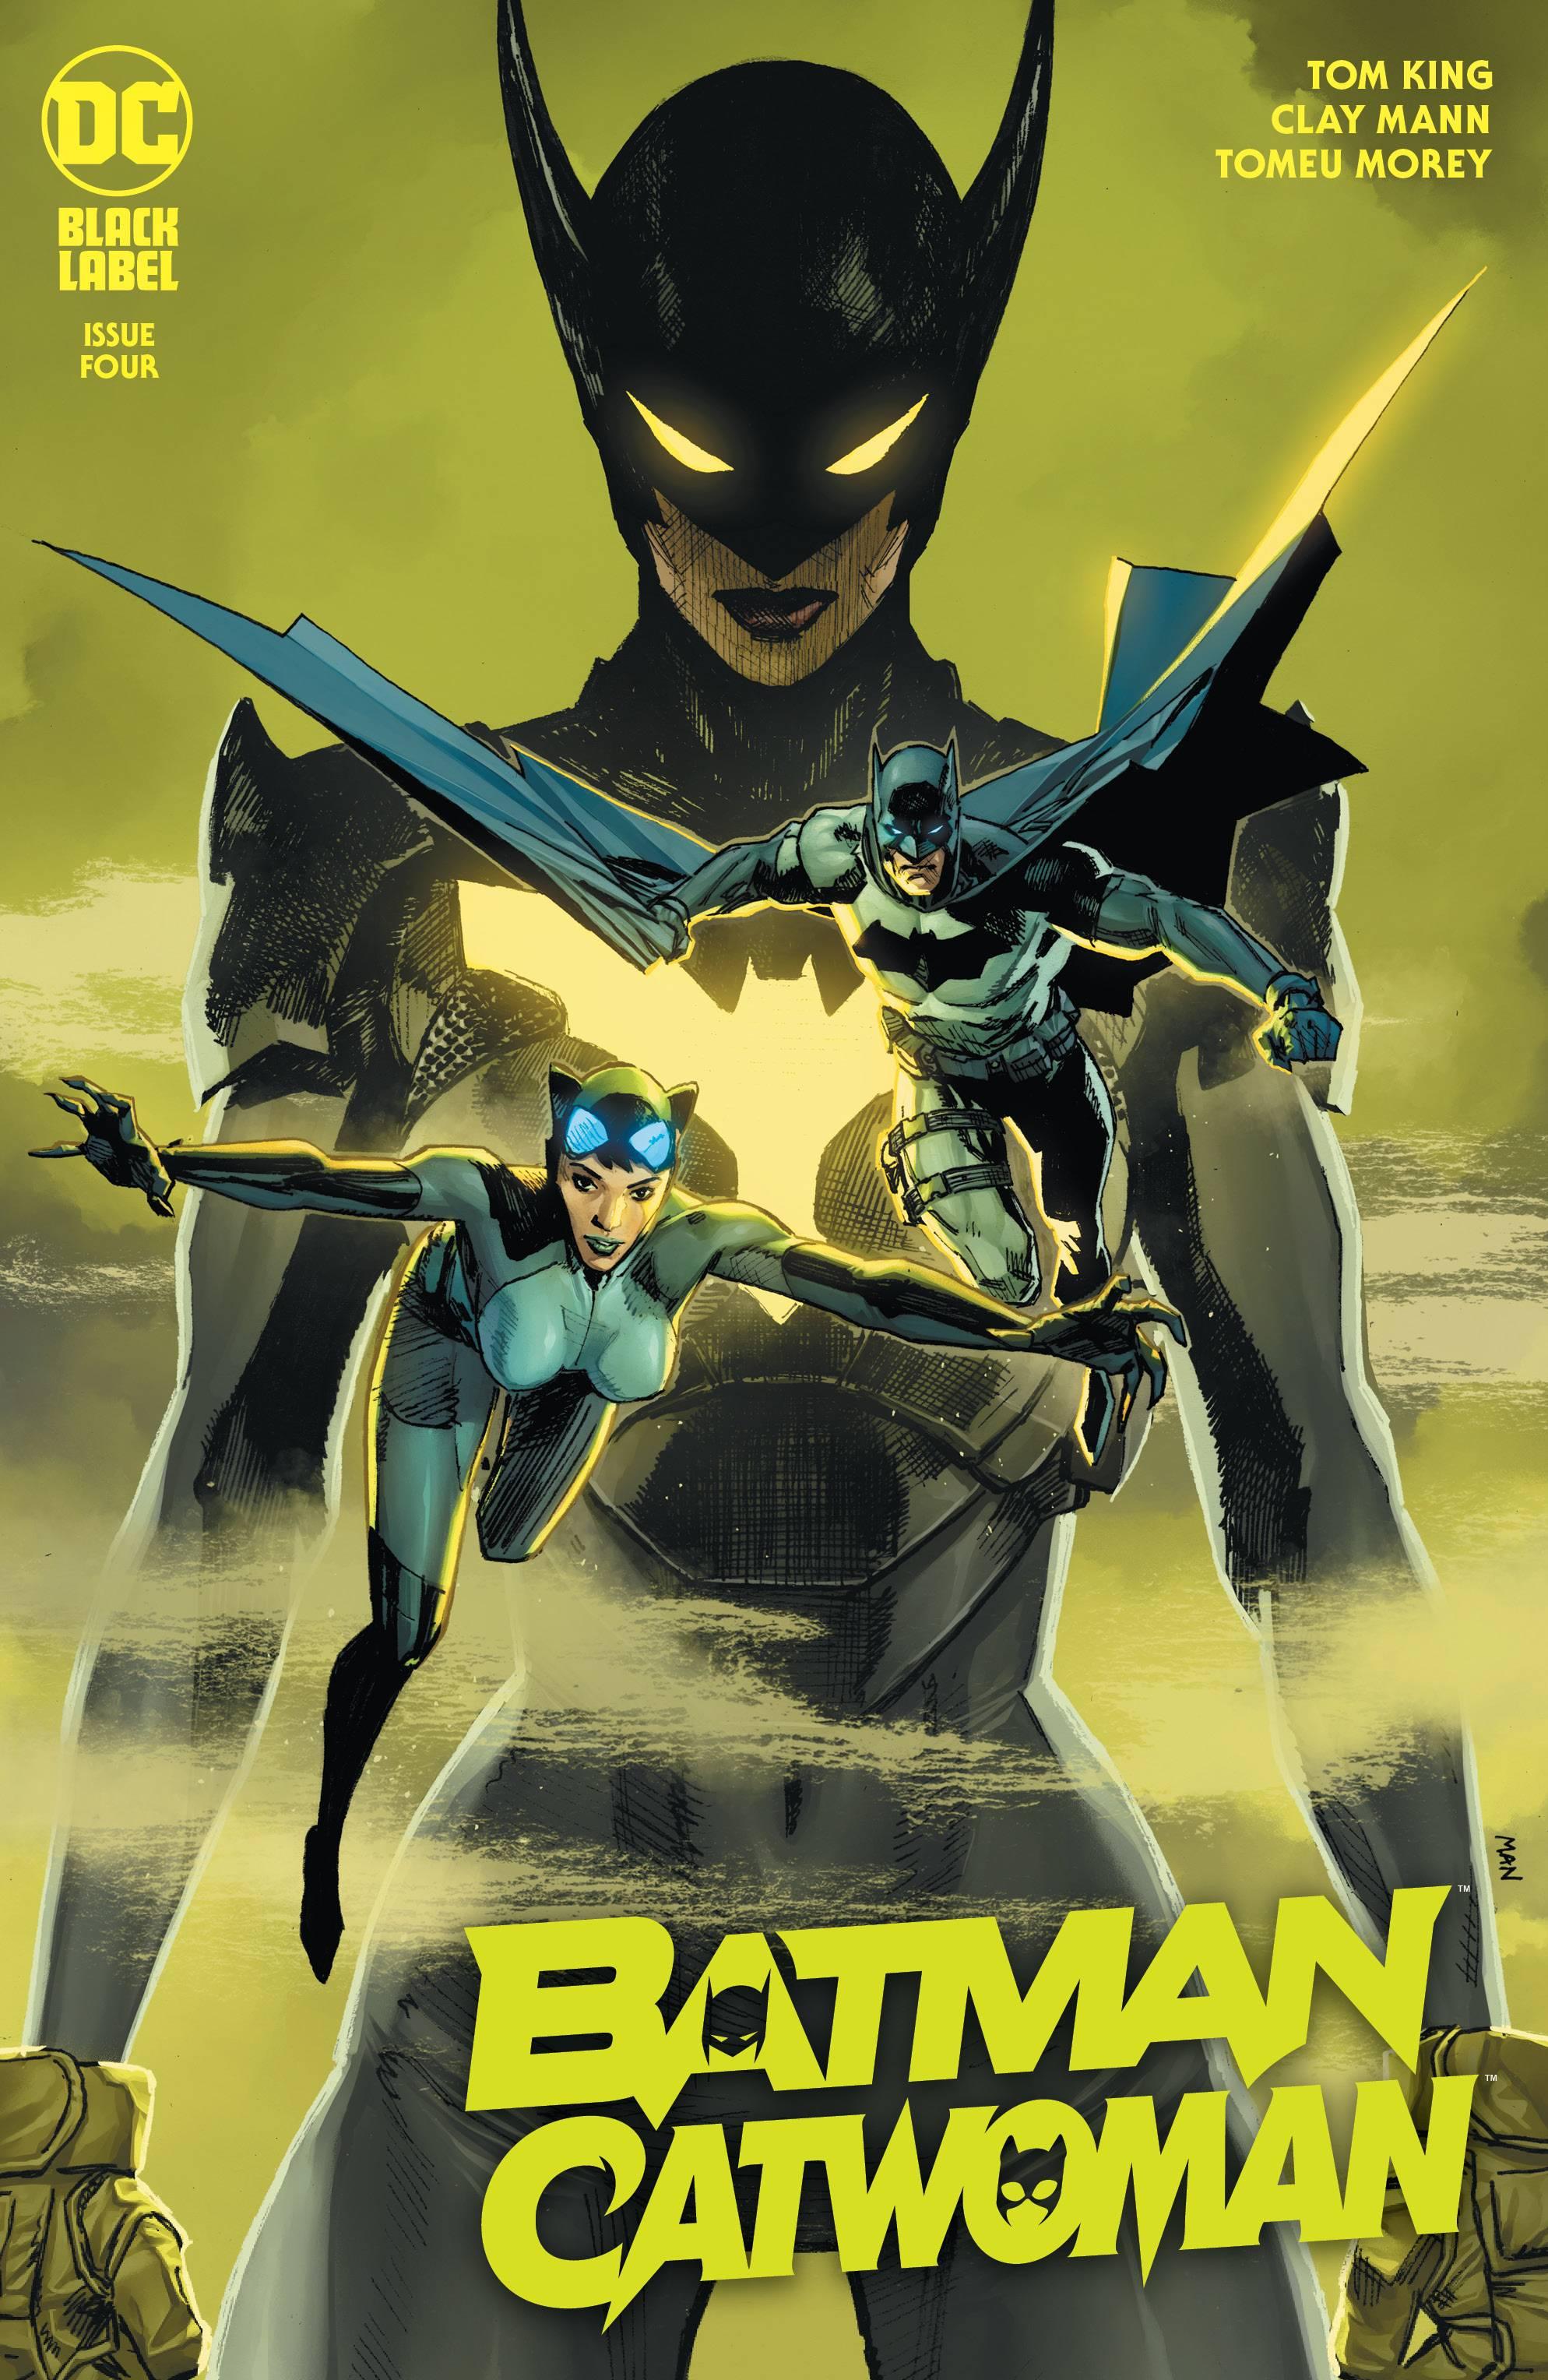 BATMAN CATWOMAN #4